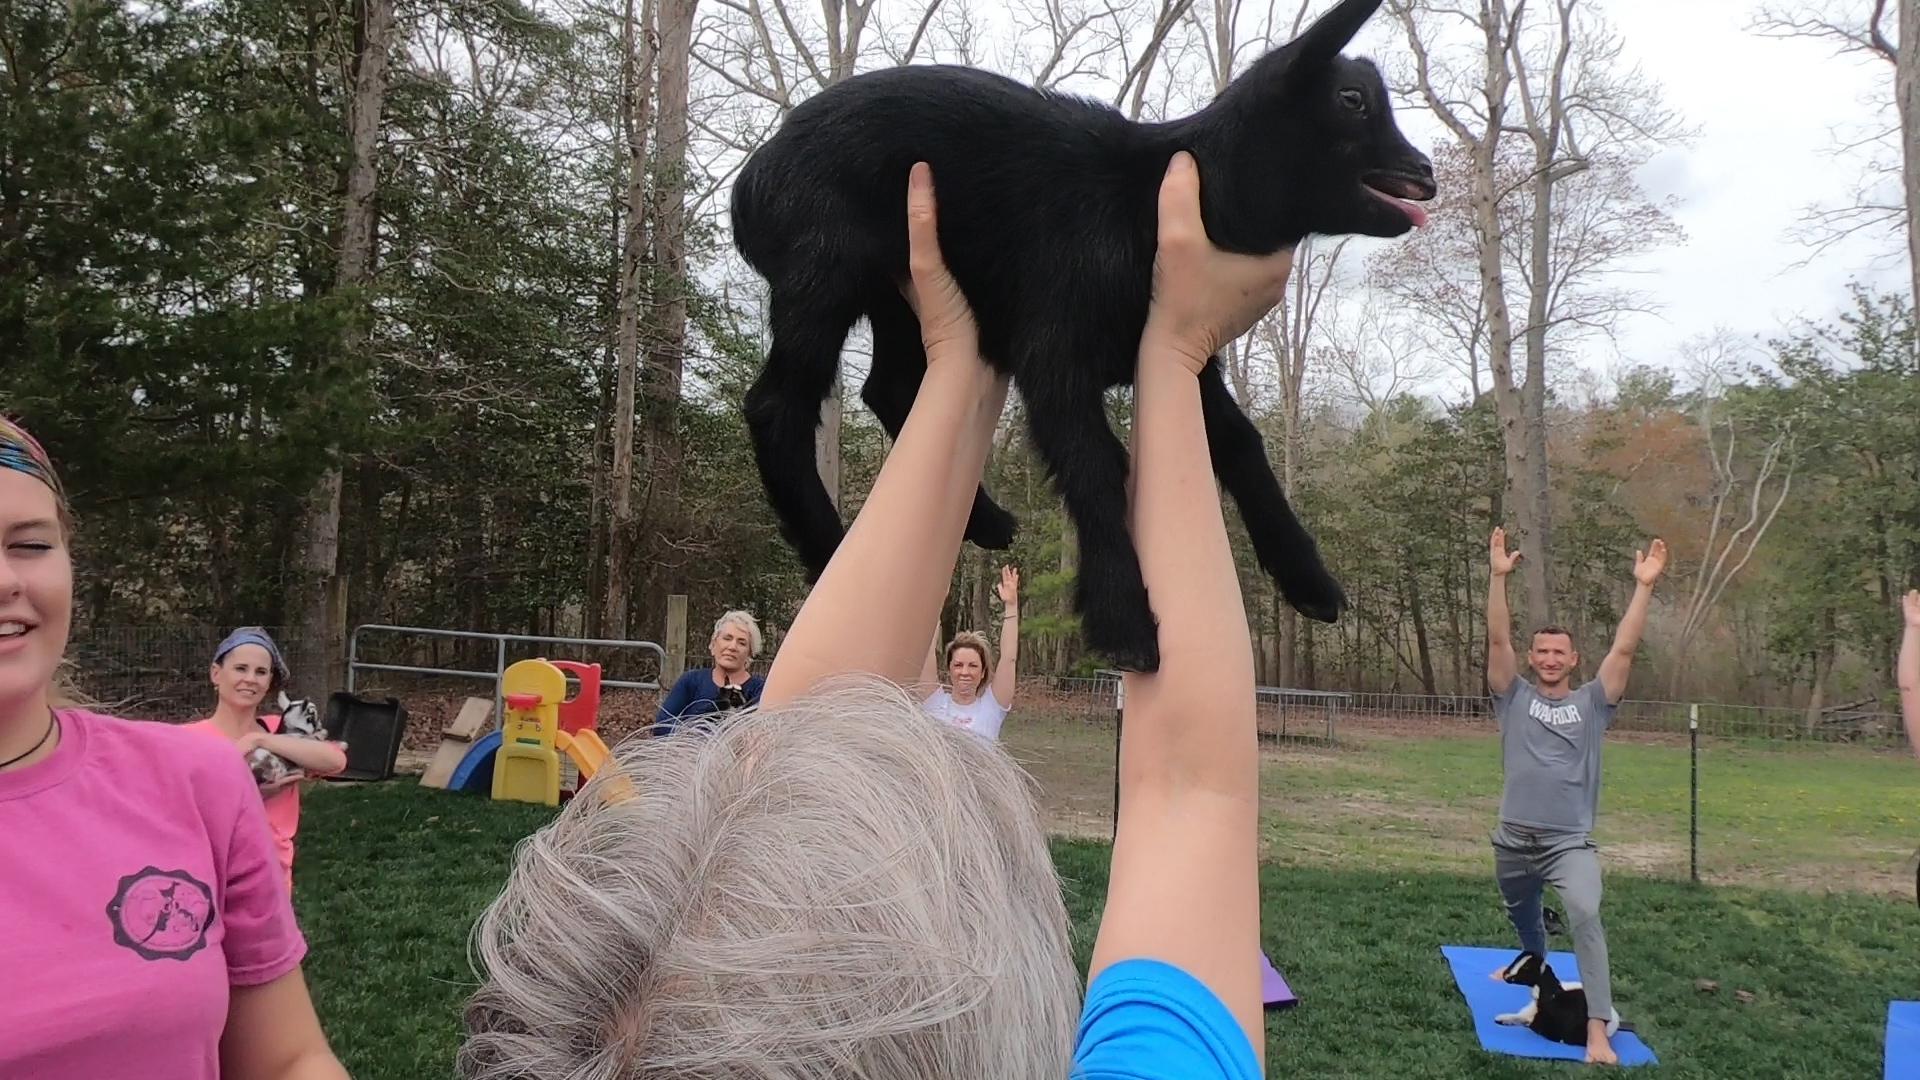 Goat Yoga! WBOC Sports' Jose Cuevas takes a Look at the Growing Phenomenon